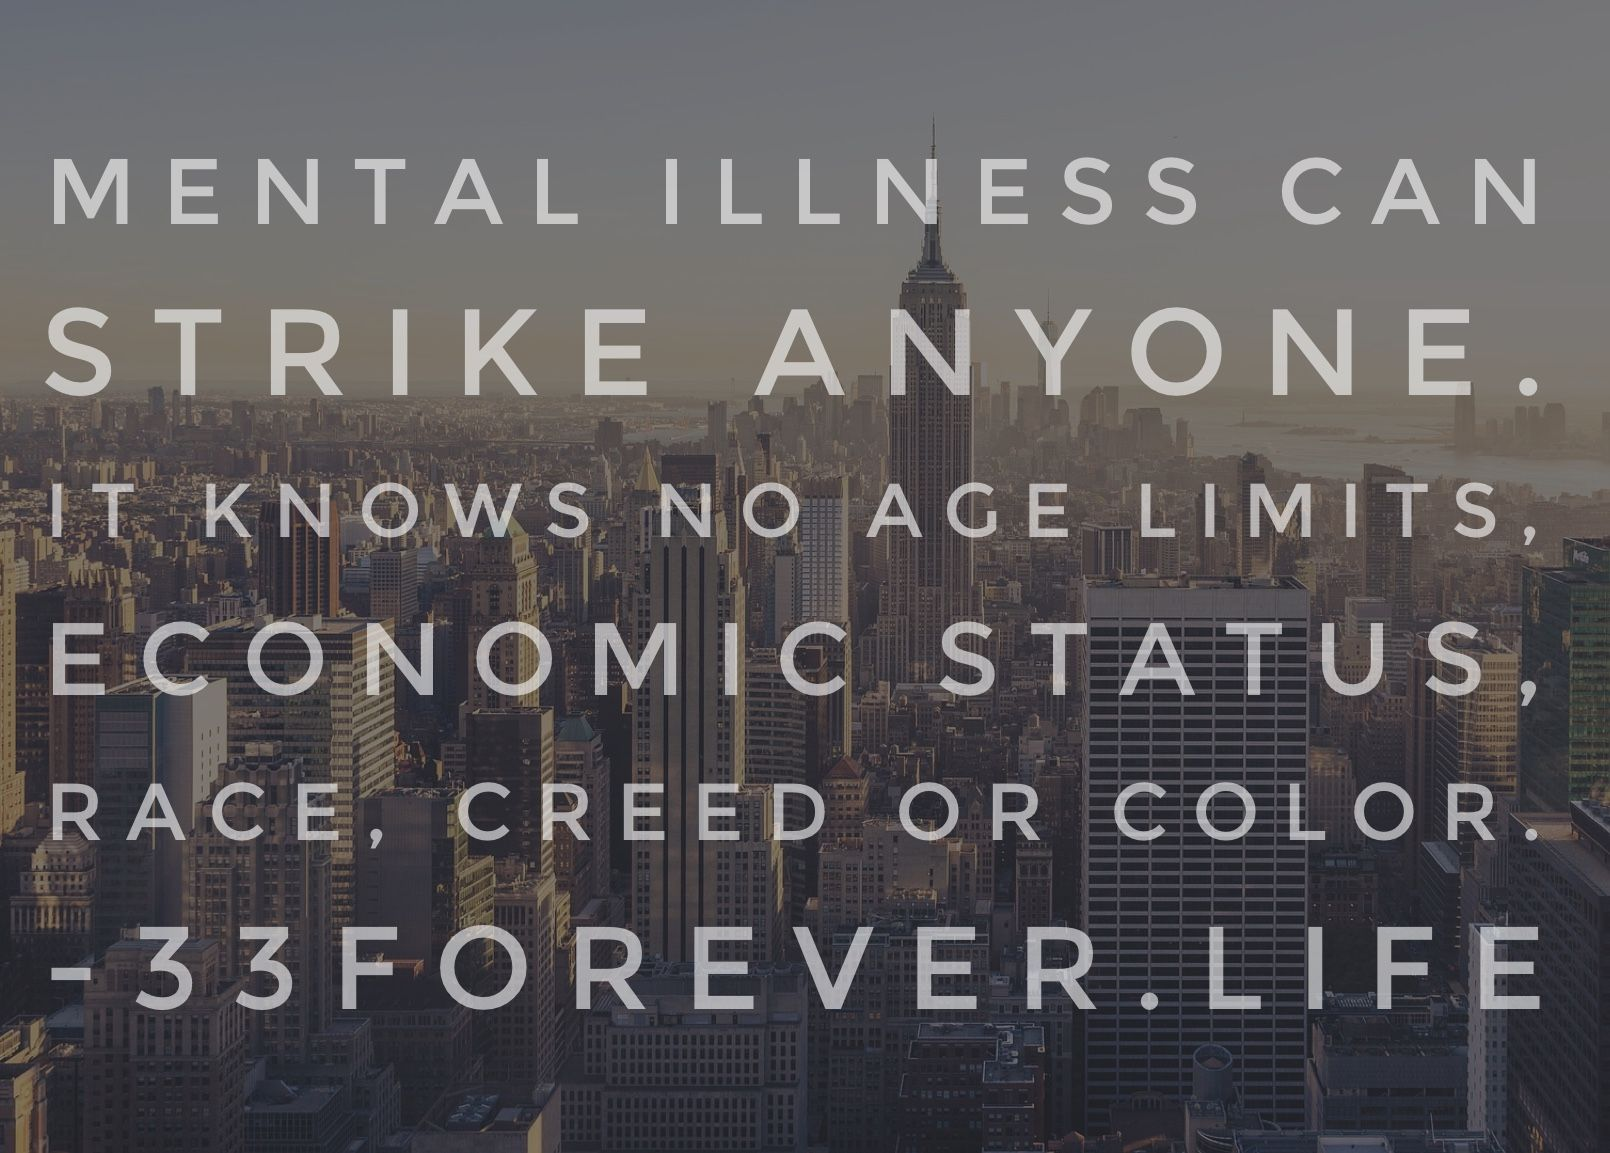 mentalhealth mentalhealthawareness mentalillness